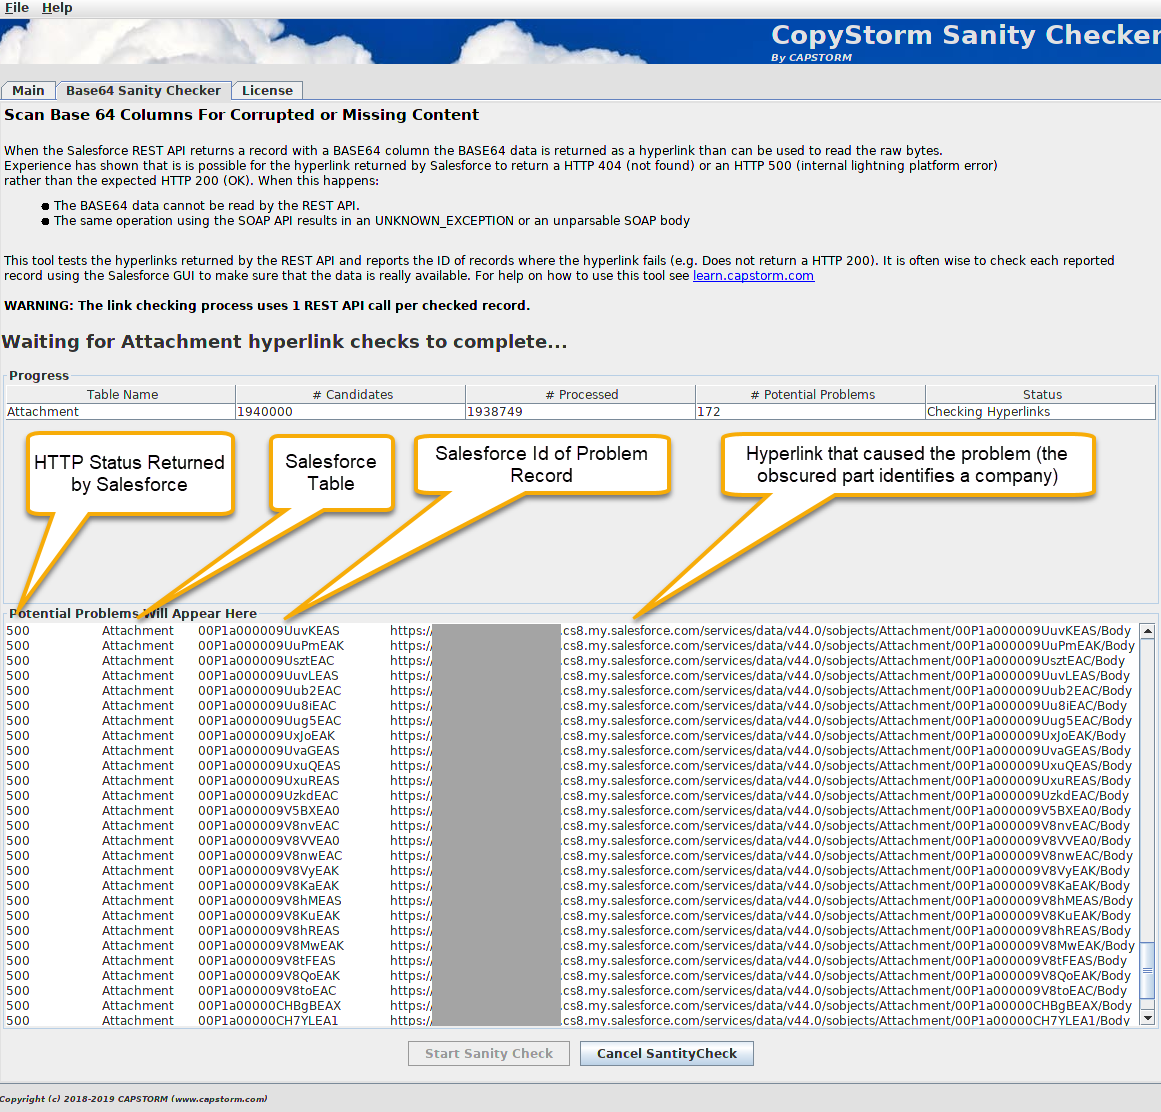 CopyStorm/SanityChecker - Capstorm Learning Center